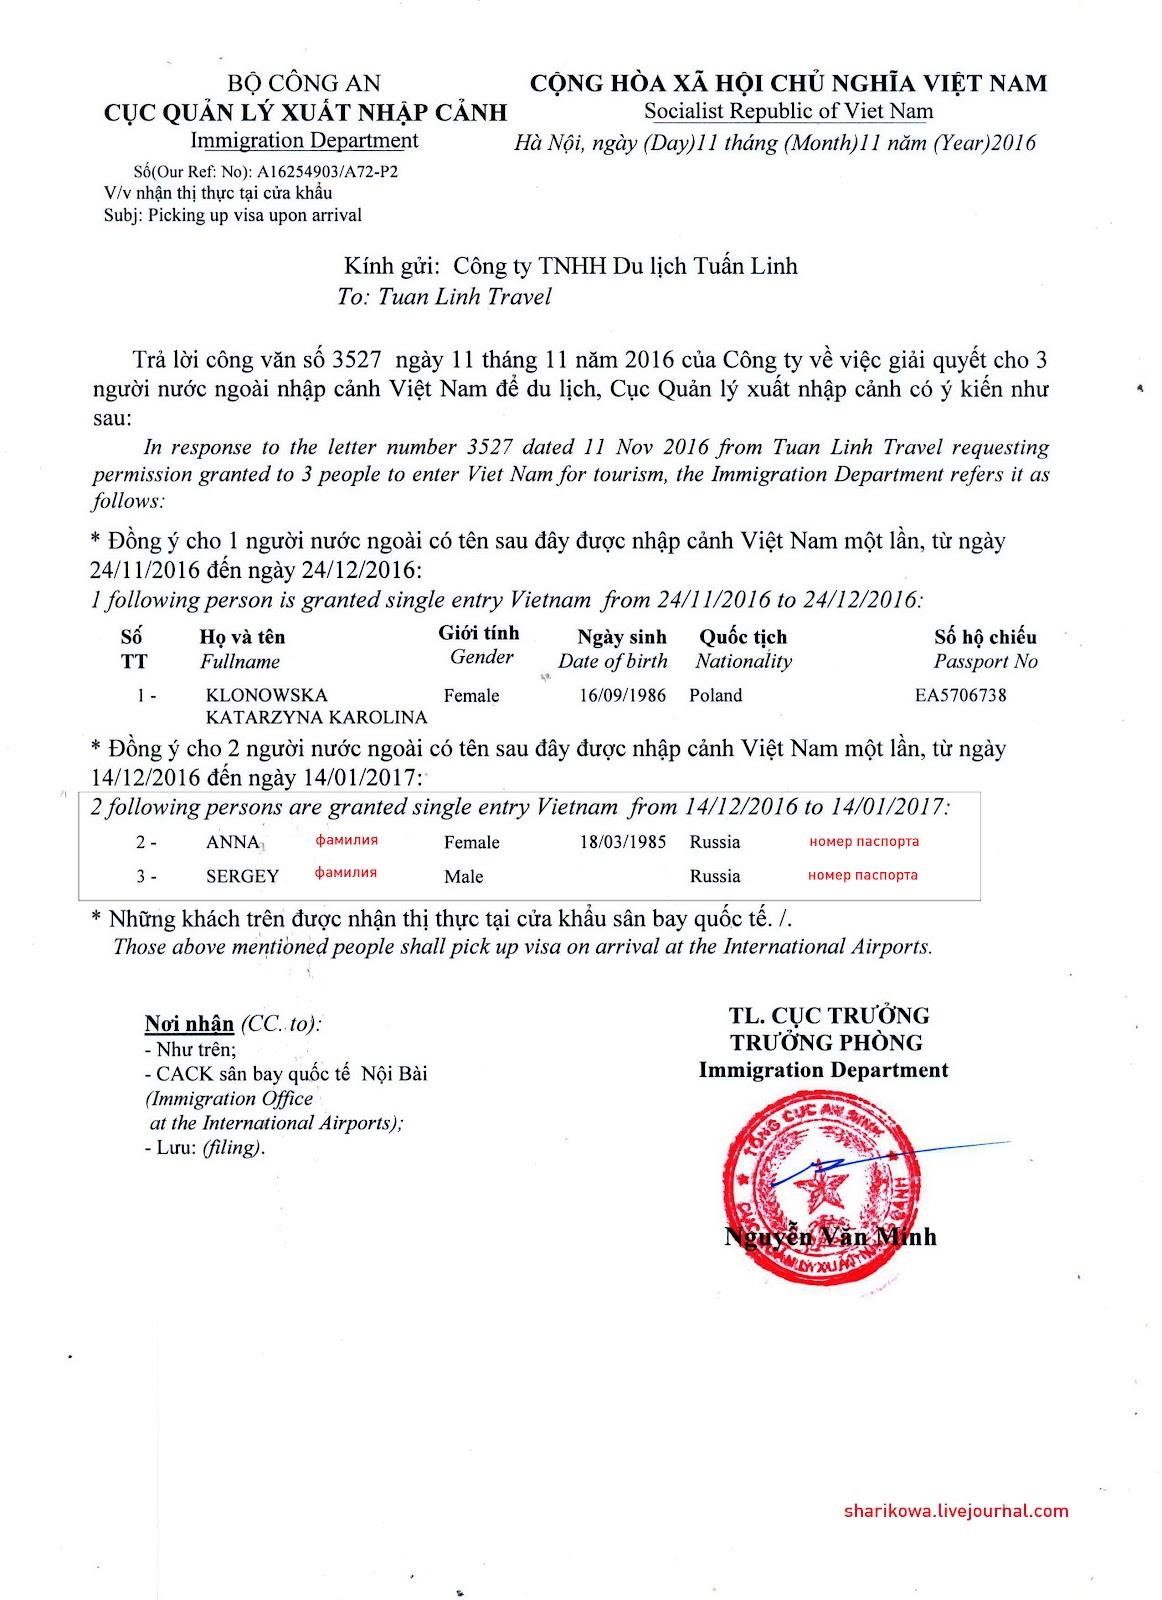 Визовая   поддержка  во  Вьетнам, APPROVAL LETTER